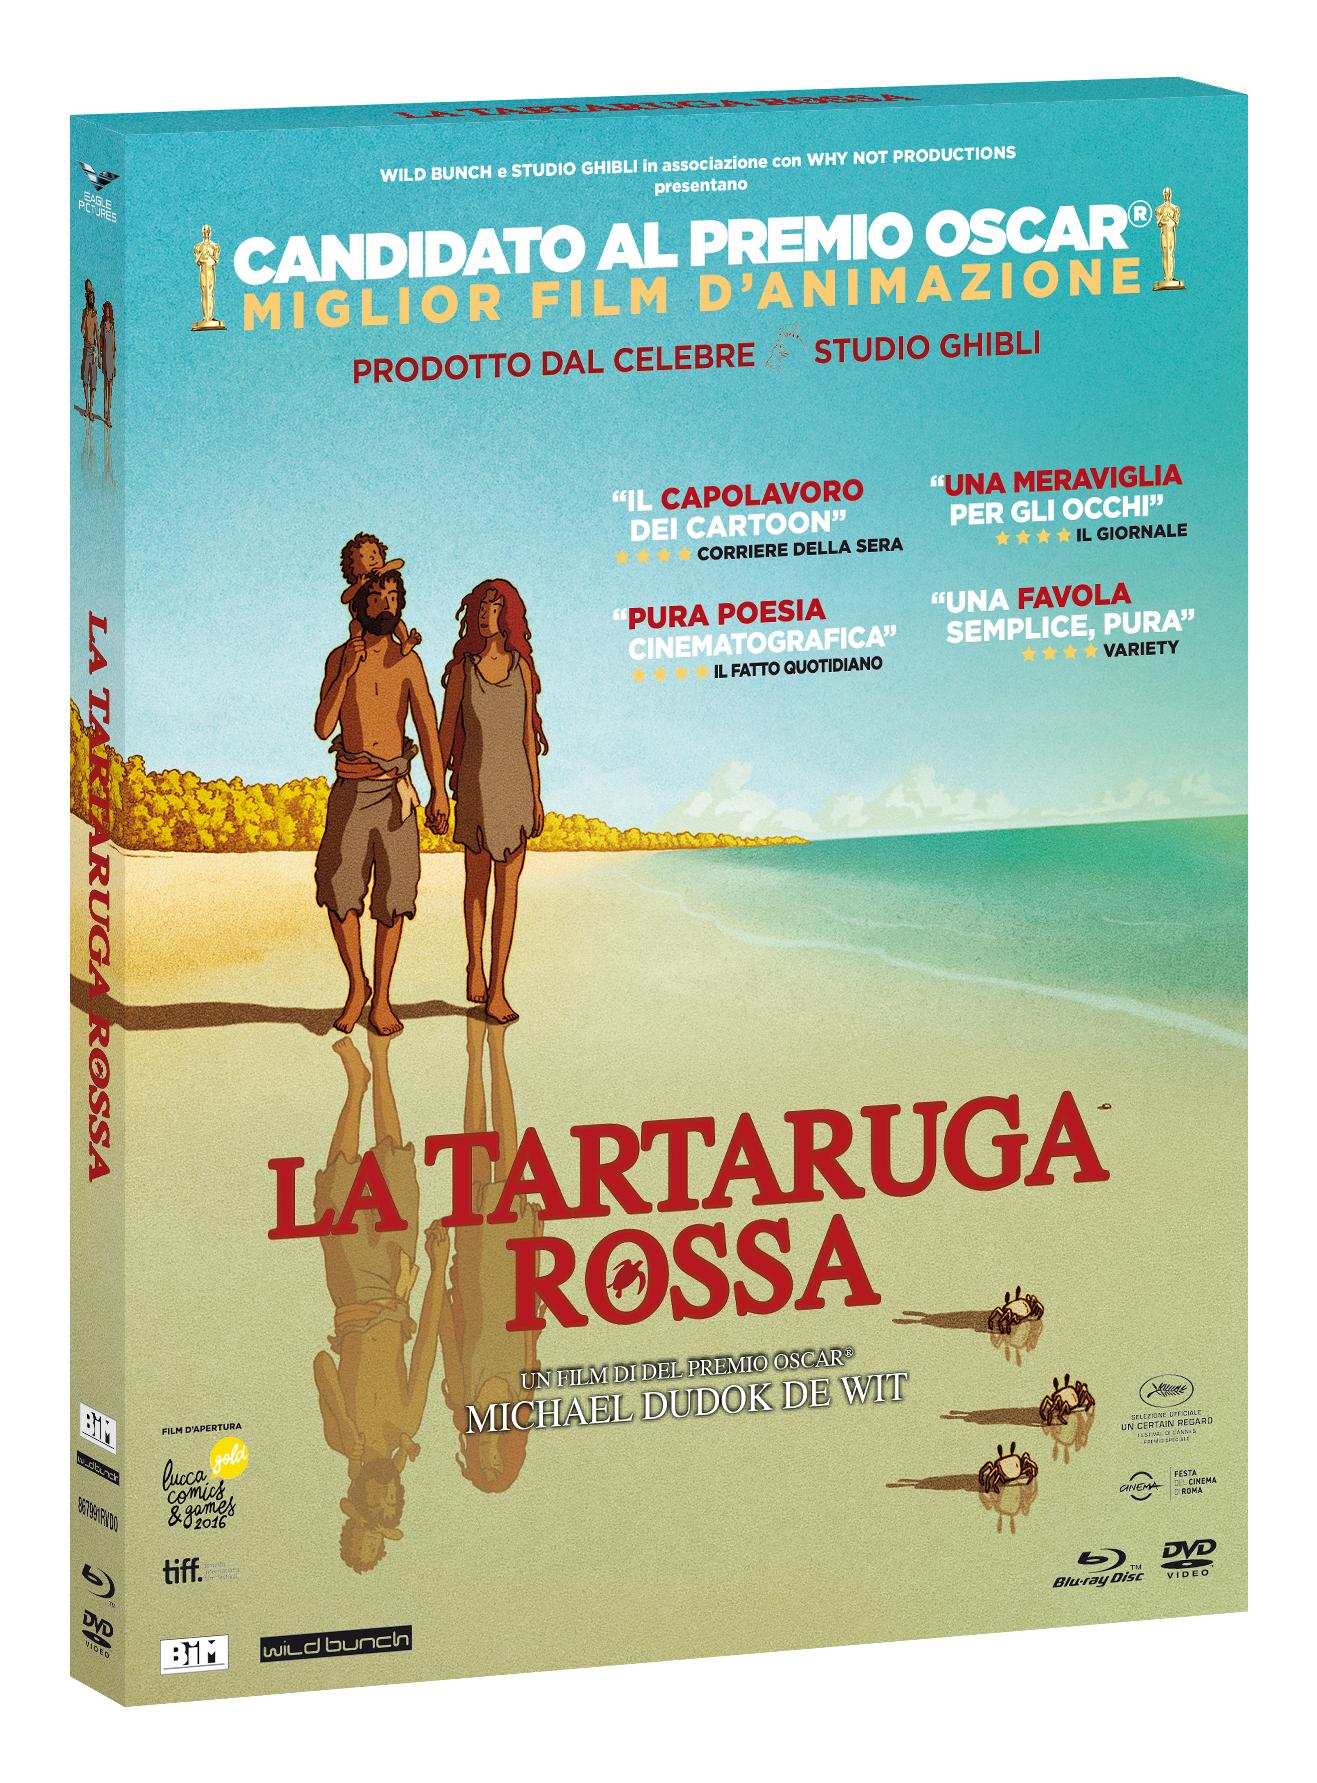 LA TARTARUGA ROSSA (BLU-RAY+DVD)